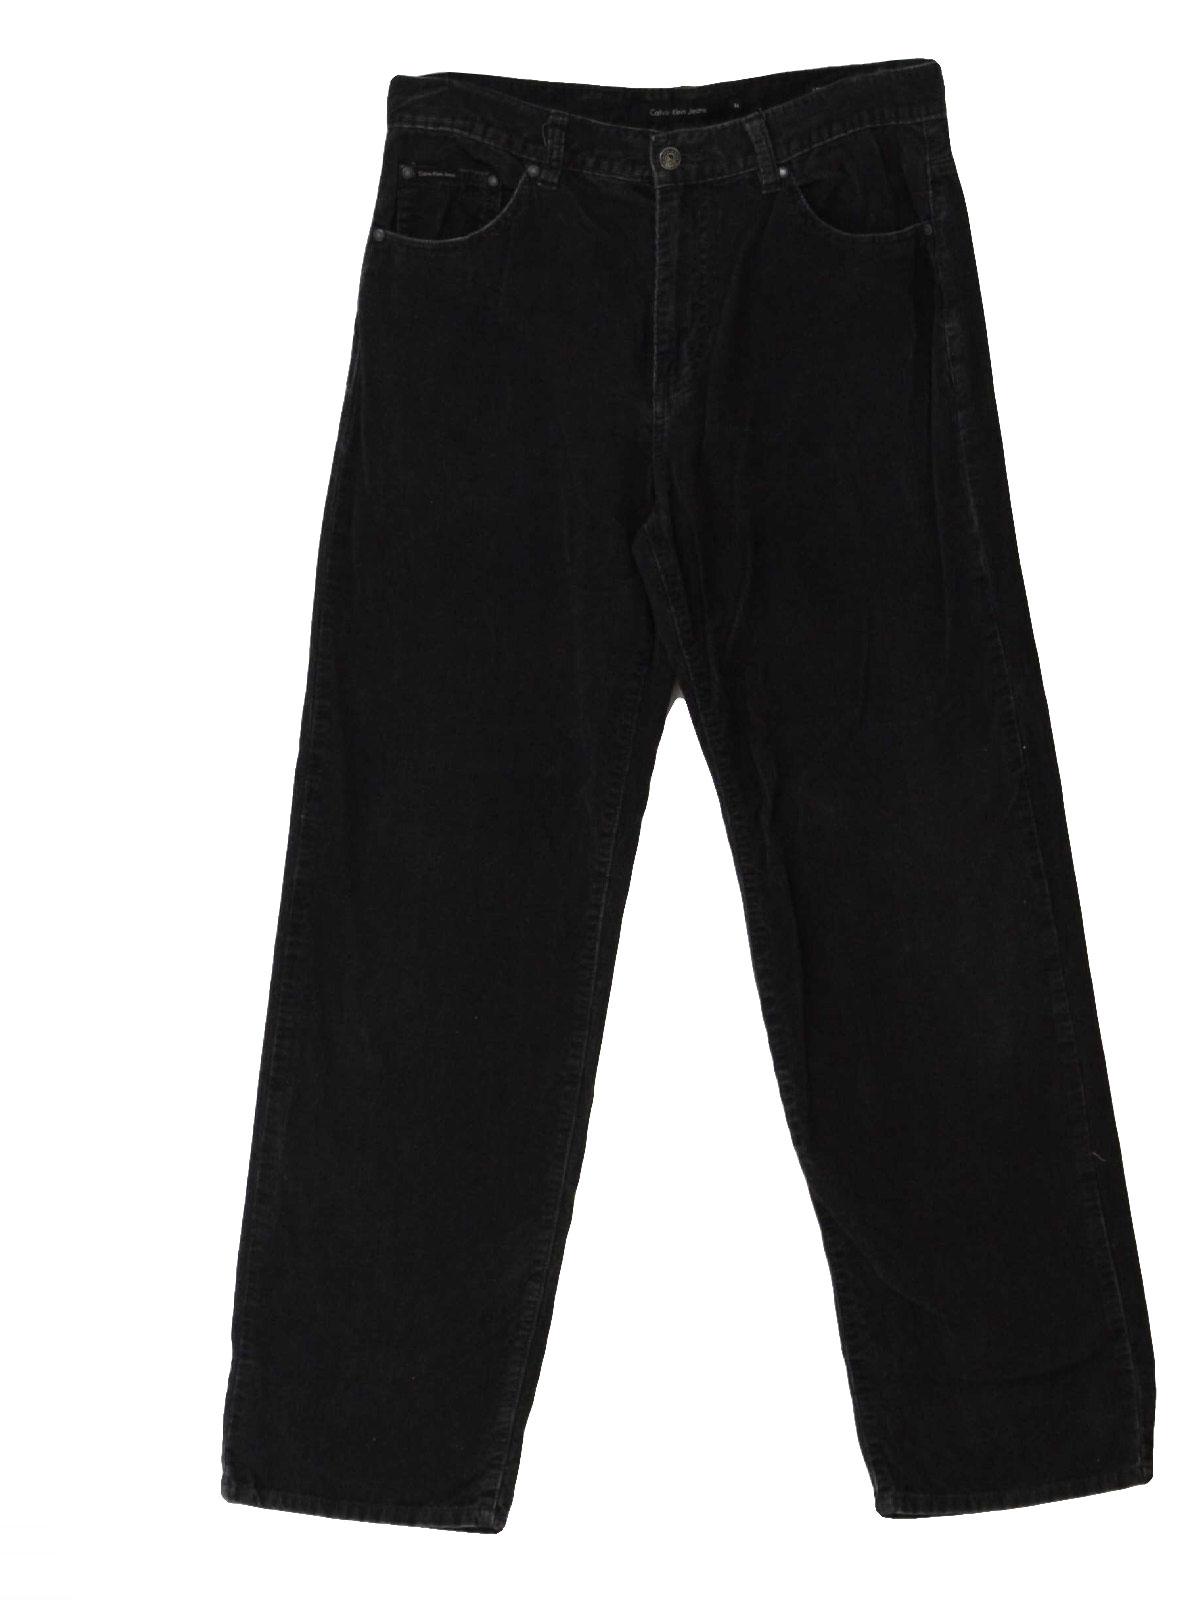 Plain Black Jeans - Xtellar Jeans